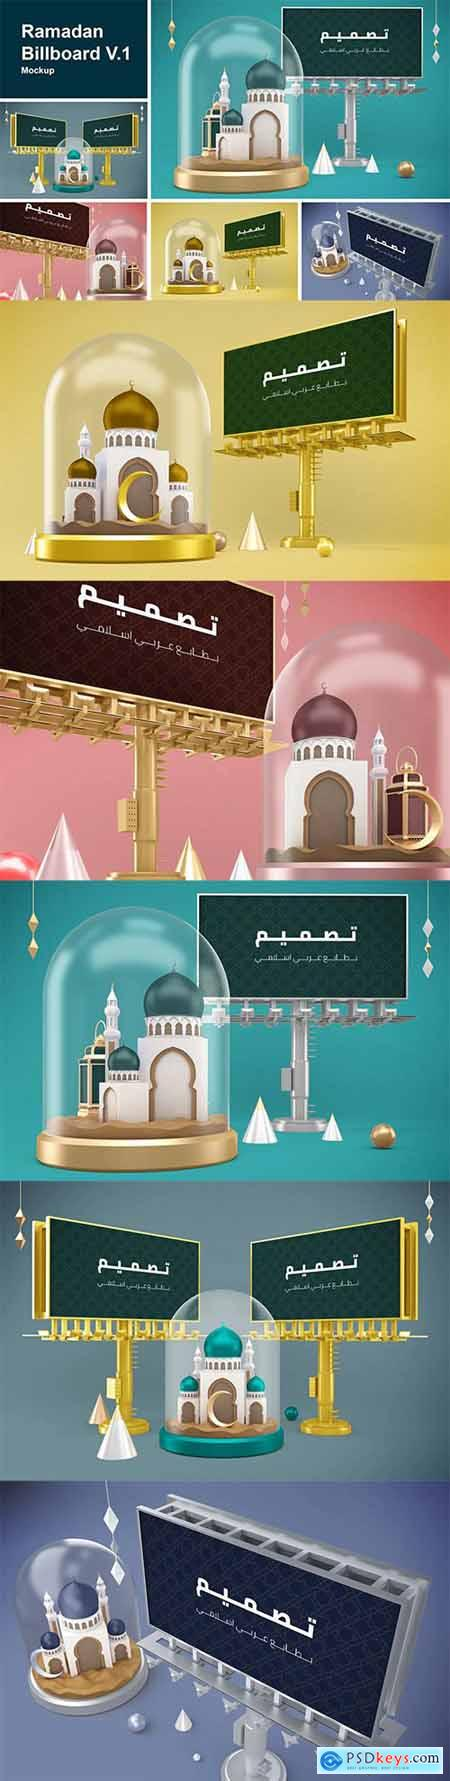 Ramadan Billboard V.1